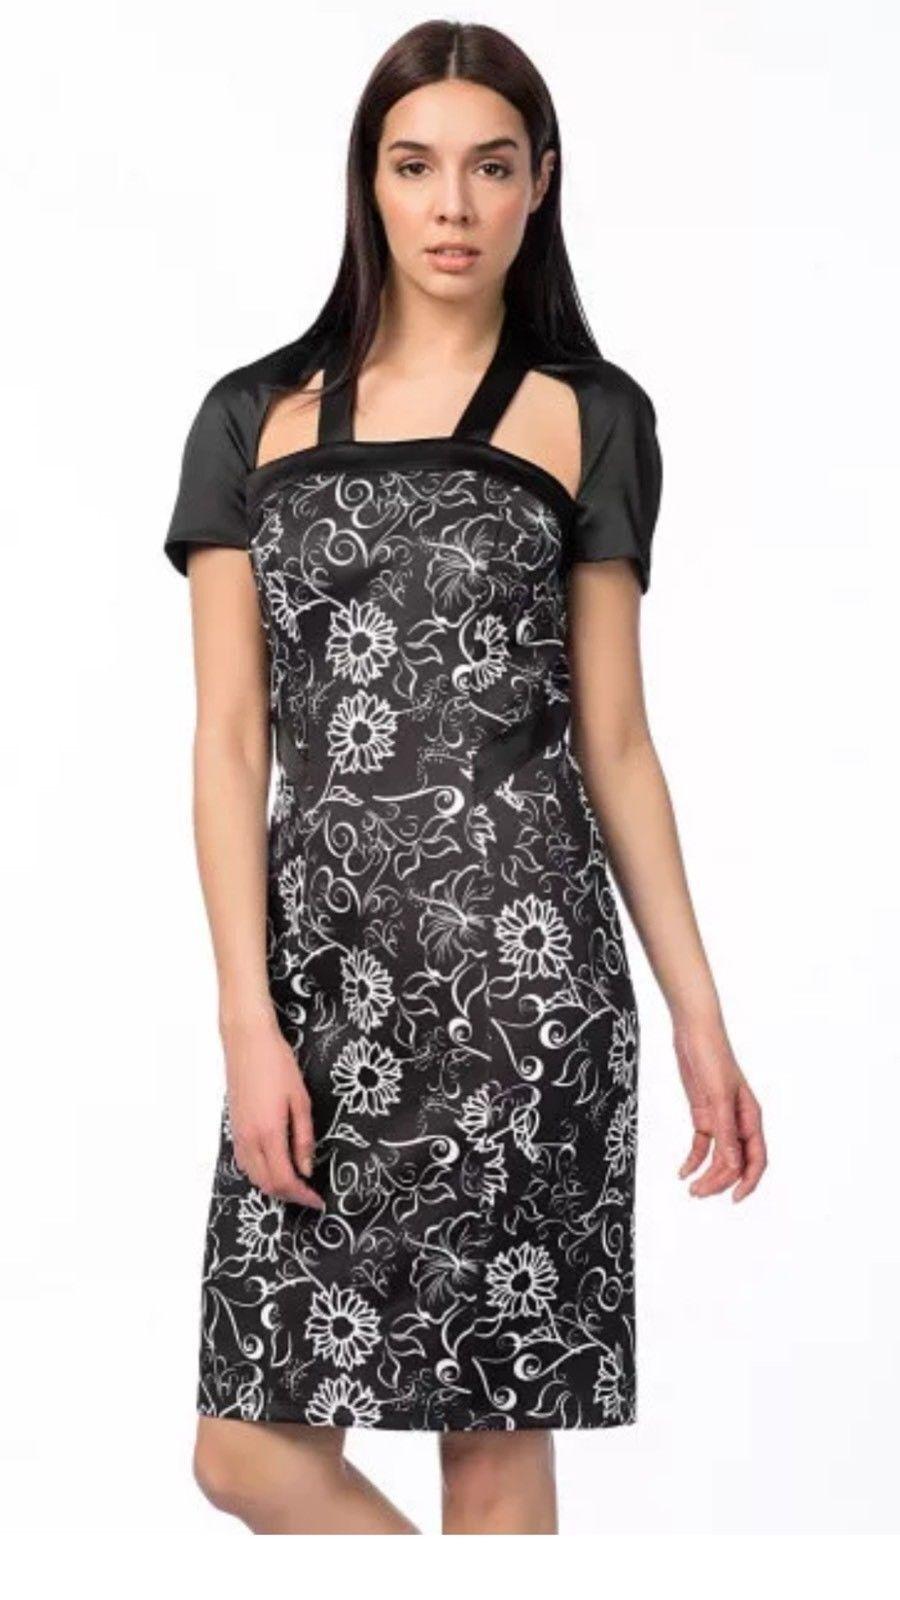 Versace 1969 schwarz floral mix stretch Pencil Party Dress Größe IT38 UK10 RRP